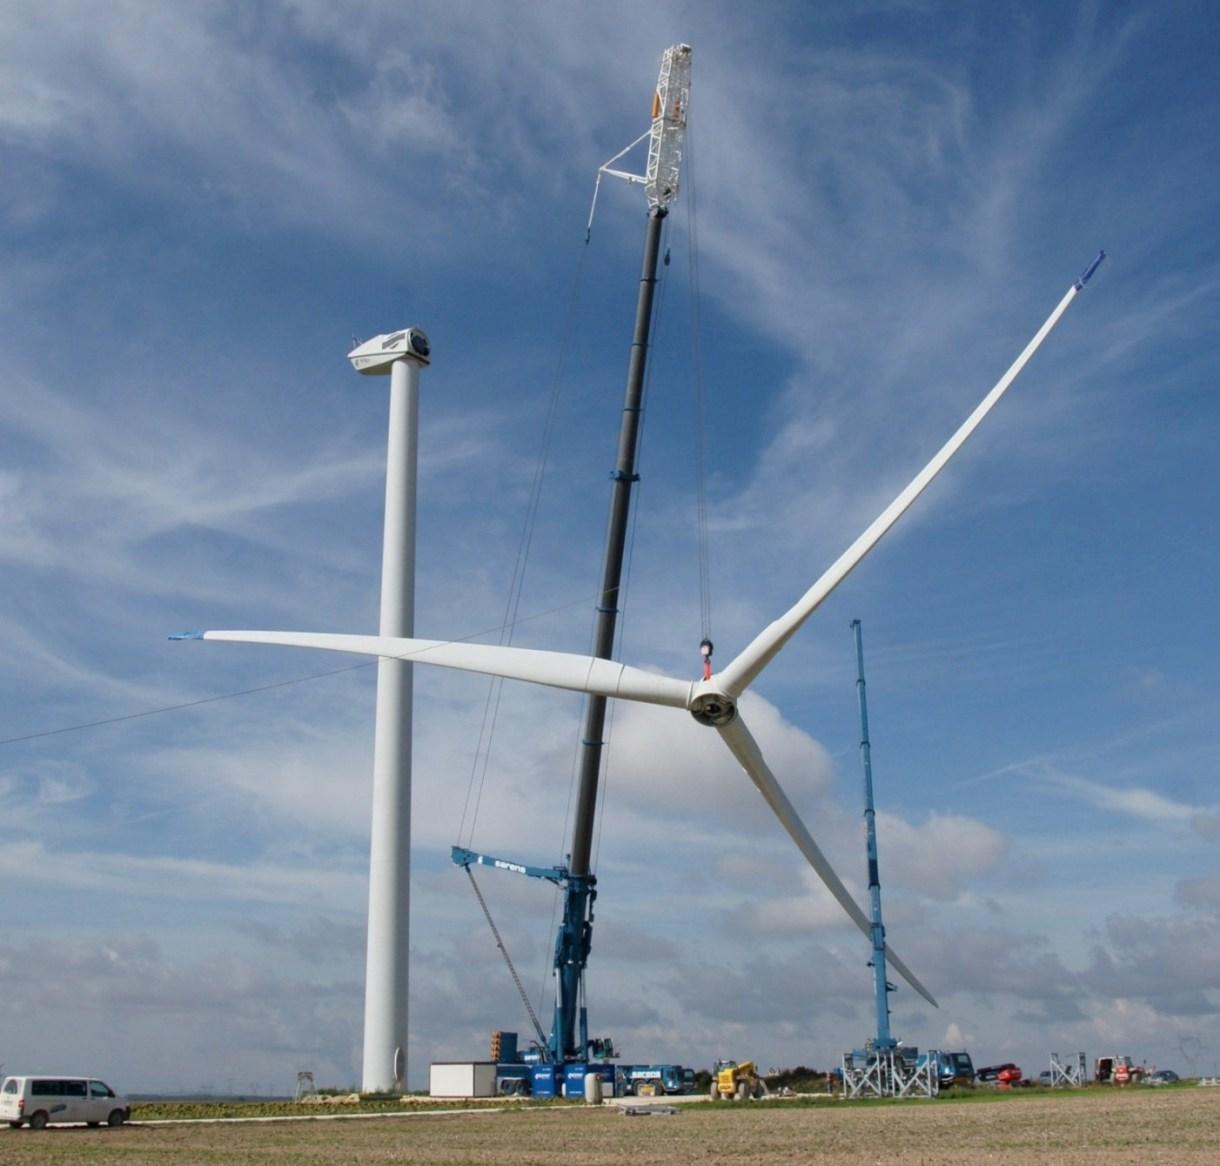 Erection Of Wind Turbines